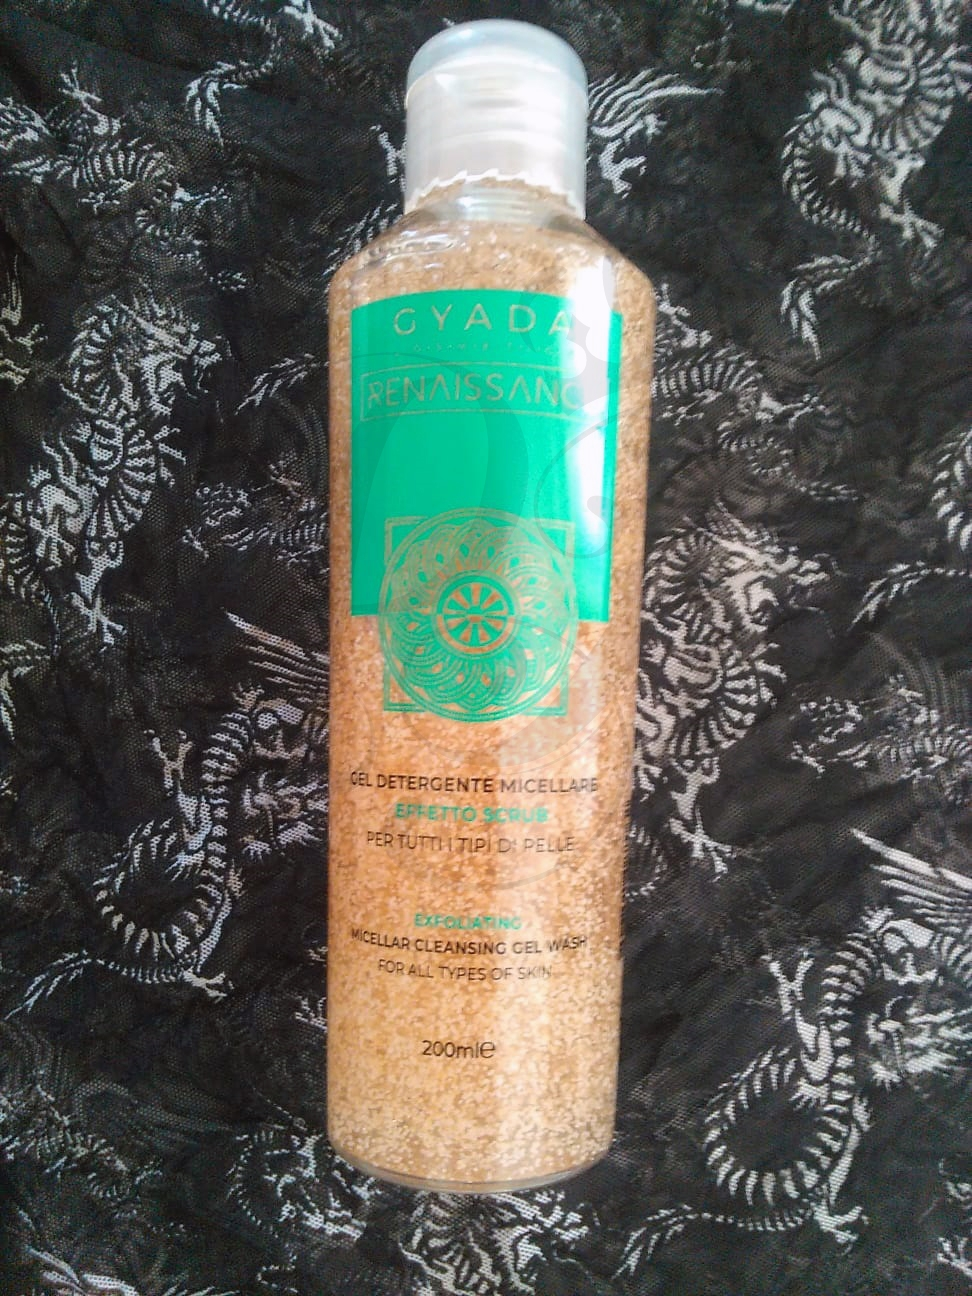 Gyada Cosmetics Detergente Scrub Micellare